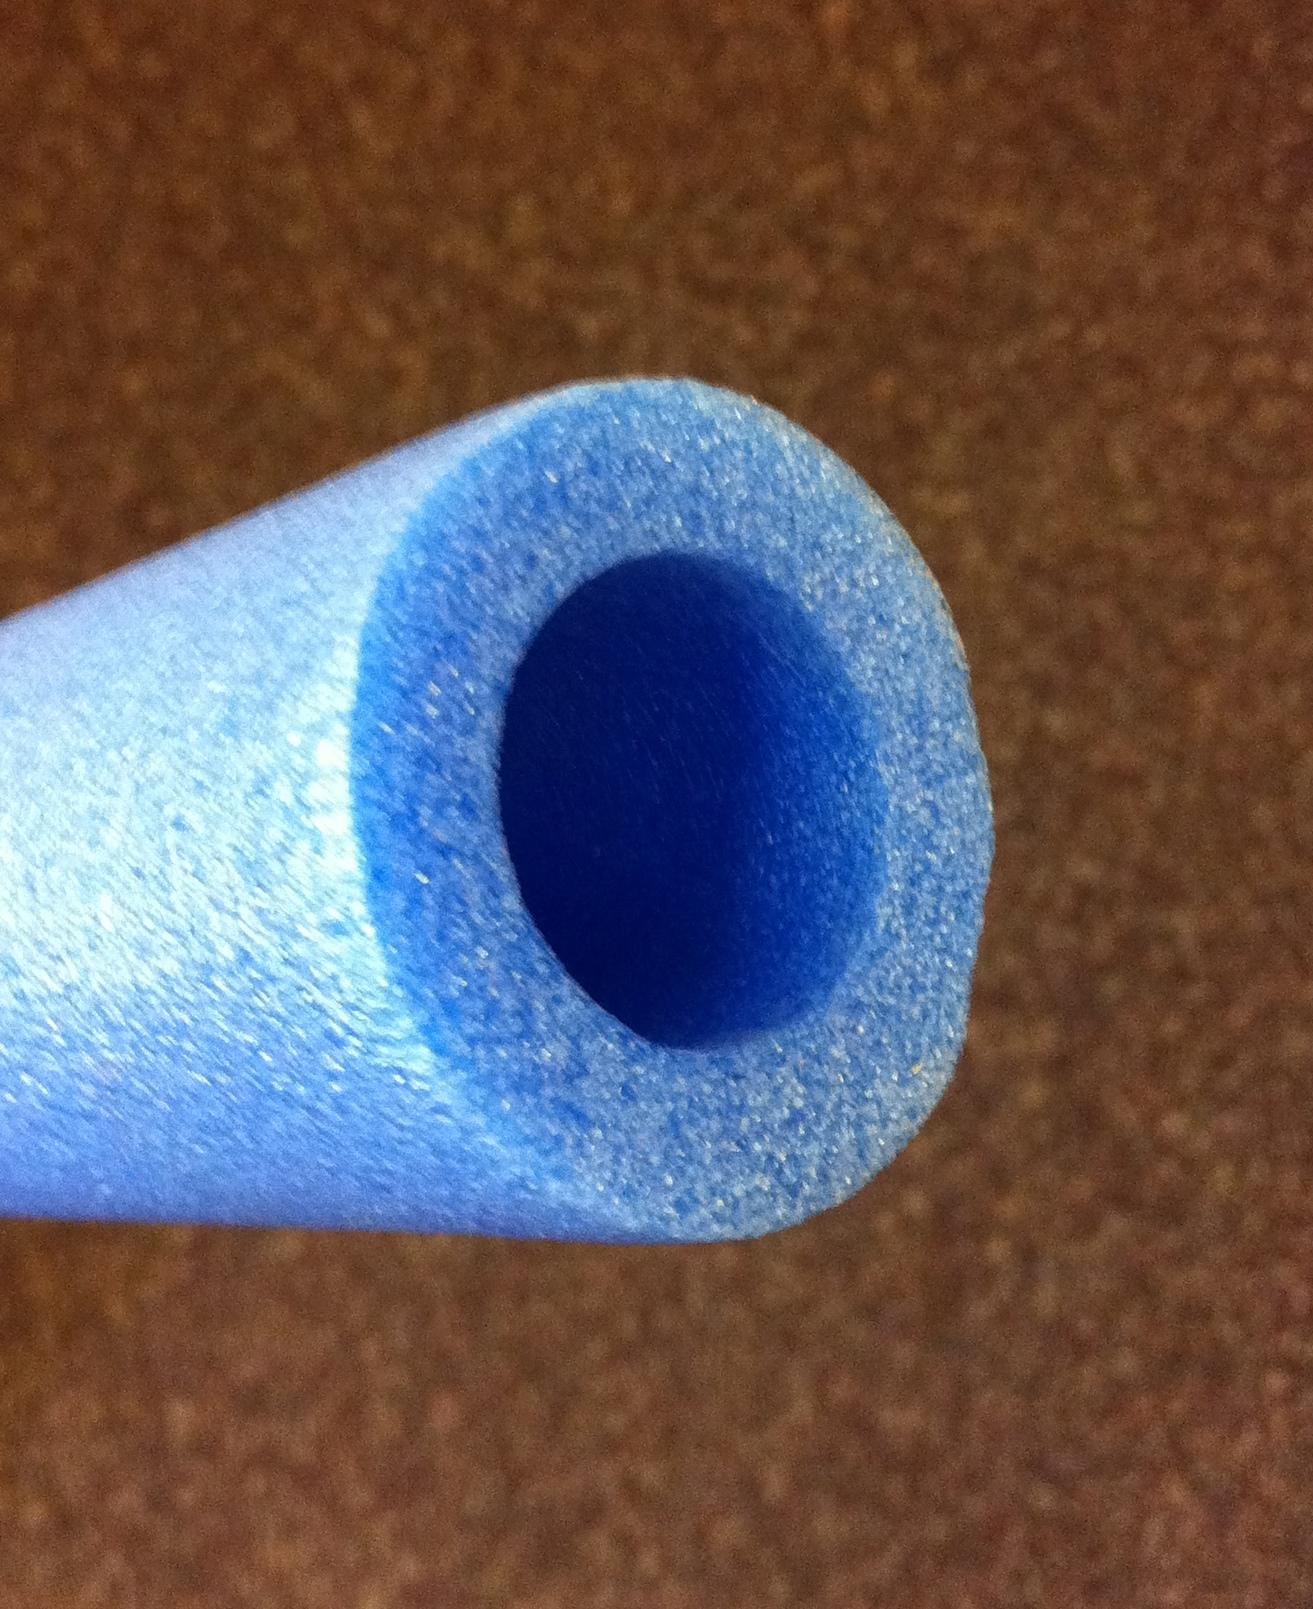 Trampoline Enclosure Foam Sleeves: 6 REPLACEMENT 8FT TRAMPOLINE ENCLOSURE FOAM POLE COVERS